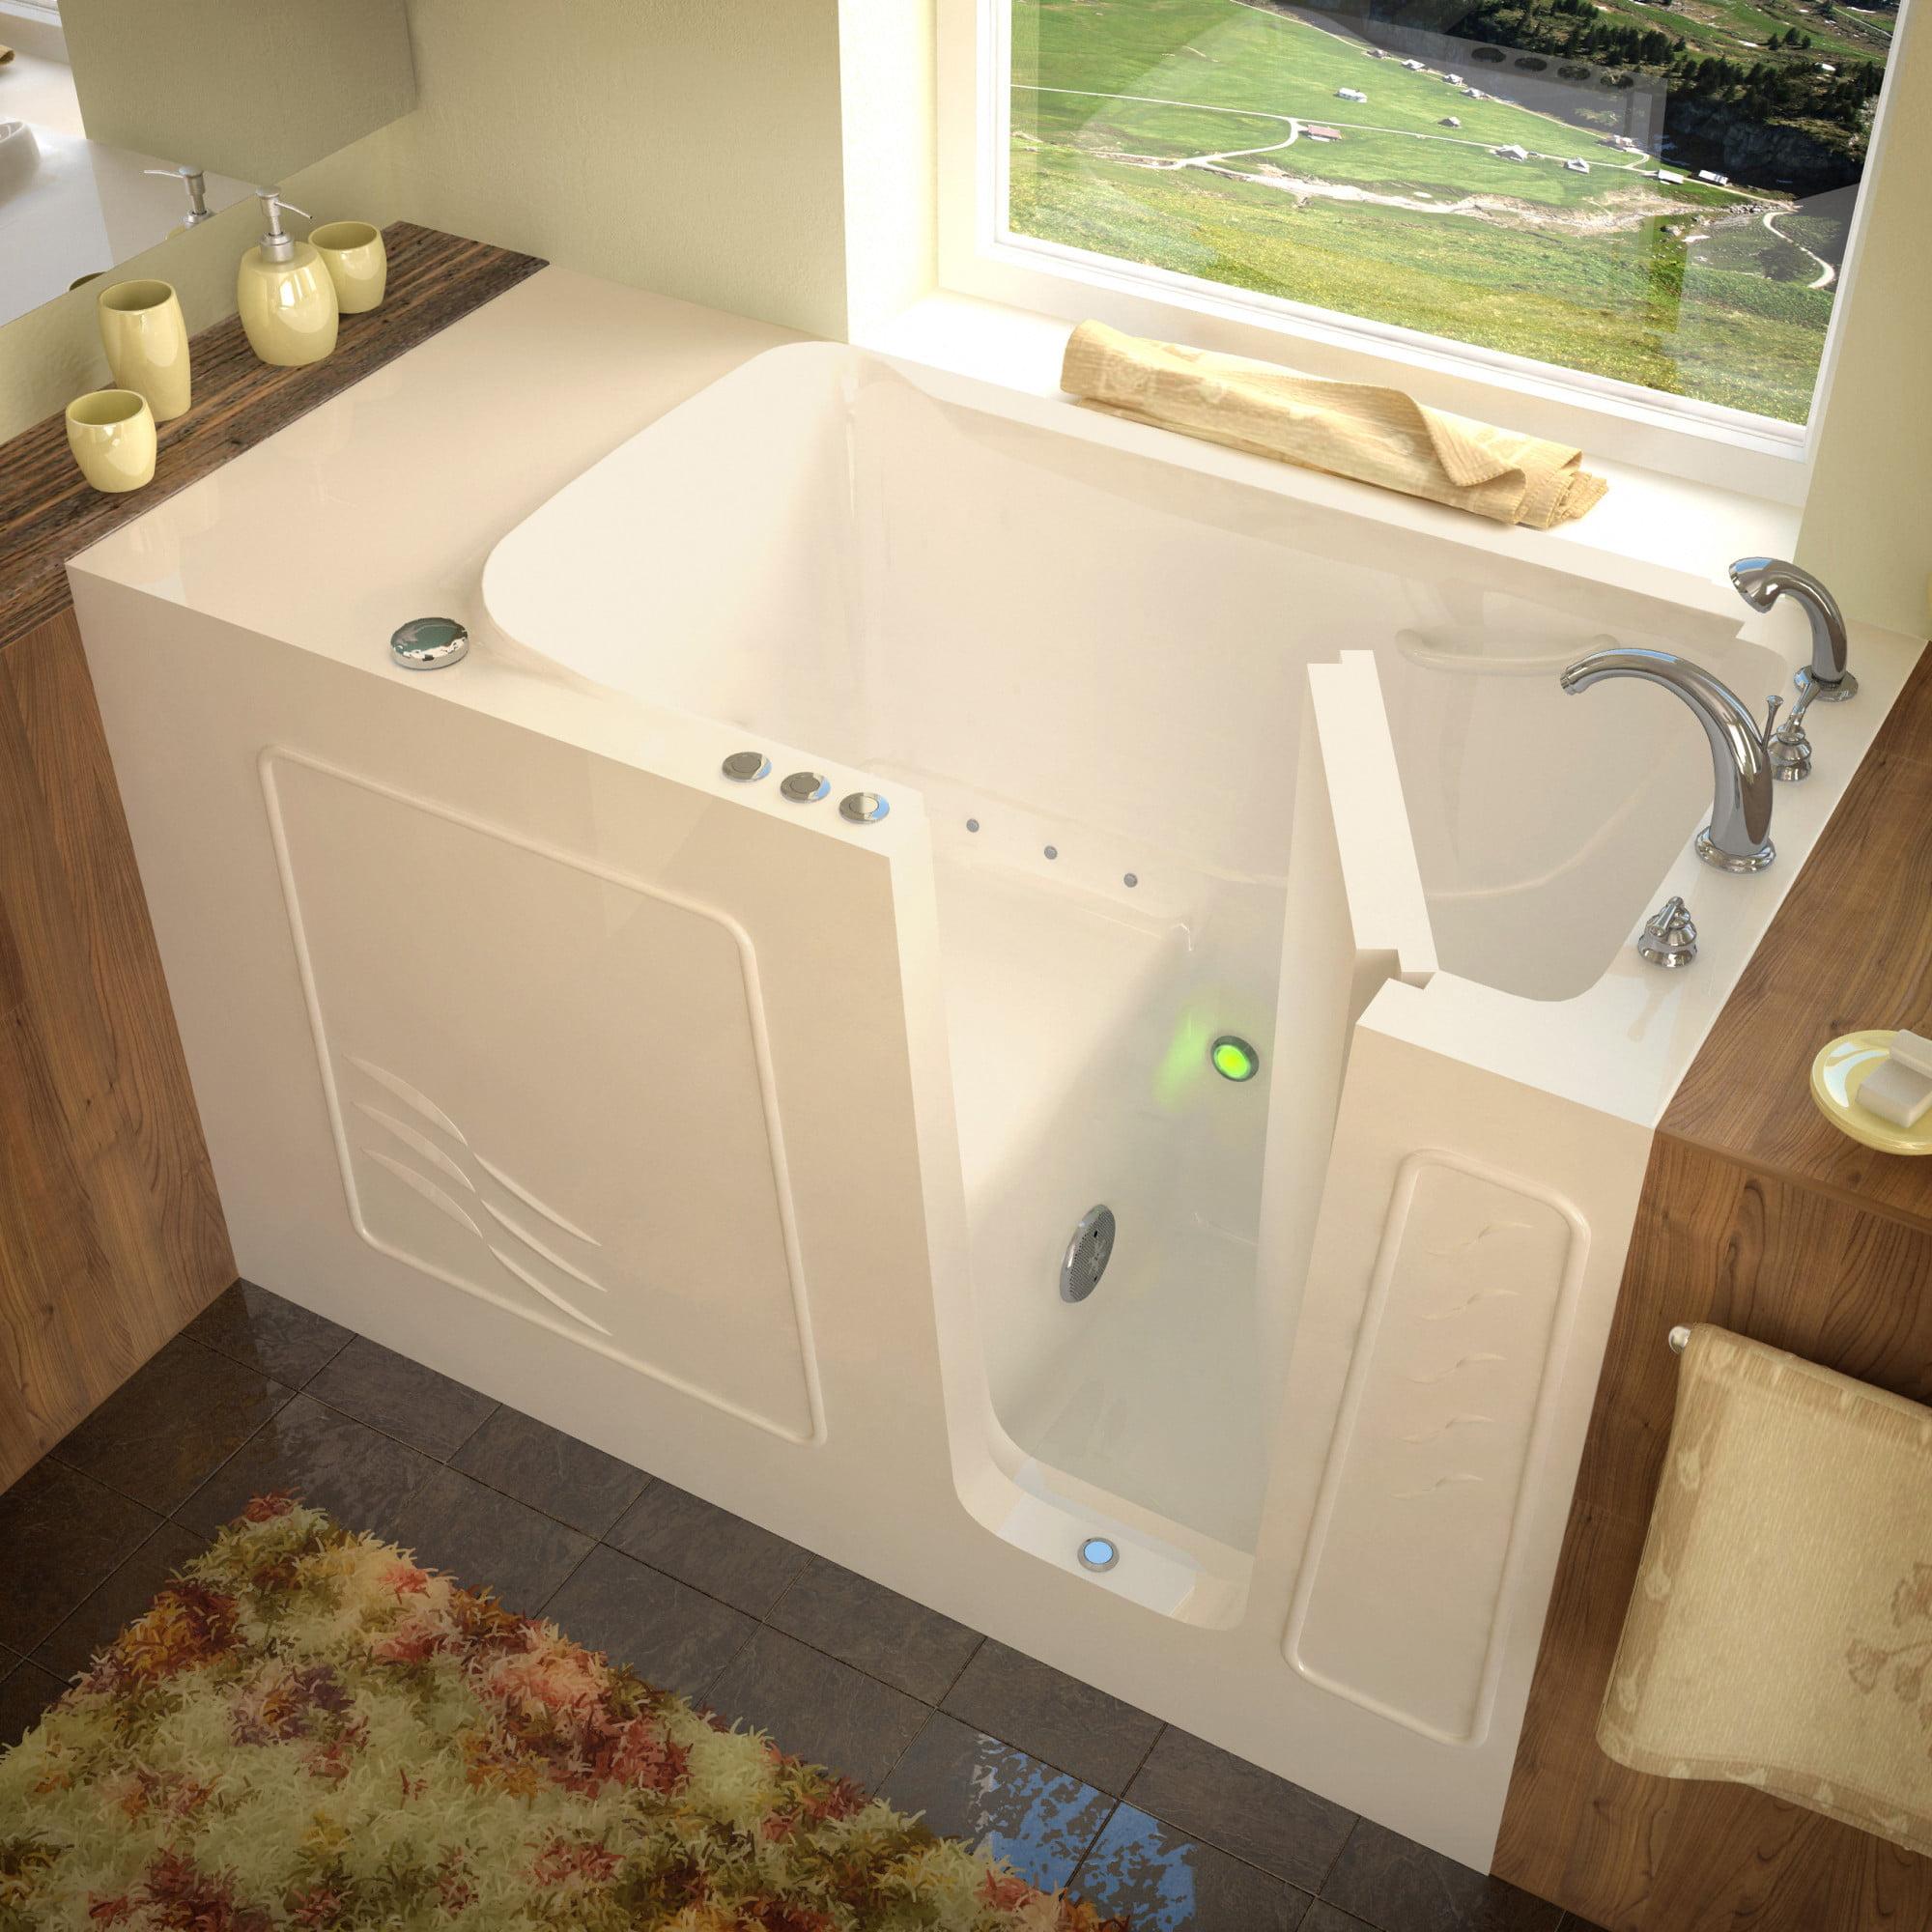 "Avano AV3060WIRA Walk-In Tubs 60"" Gel Coated Air Bathtub for Alcove Installations w/ Right Drain, Roman Tub Faucet & Handshower"